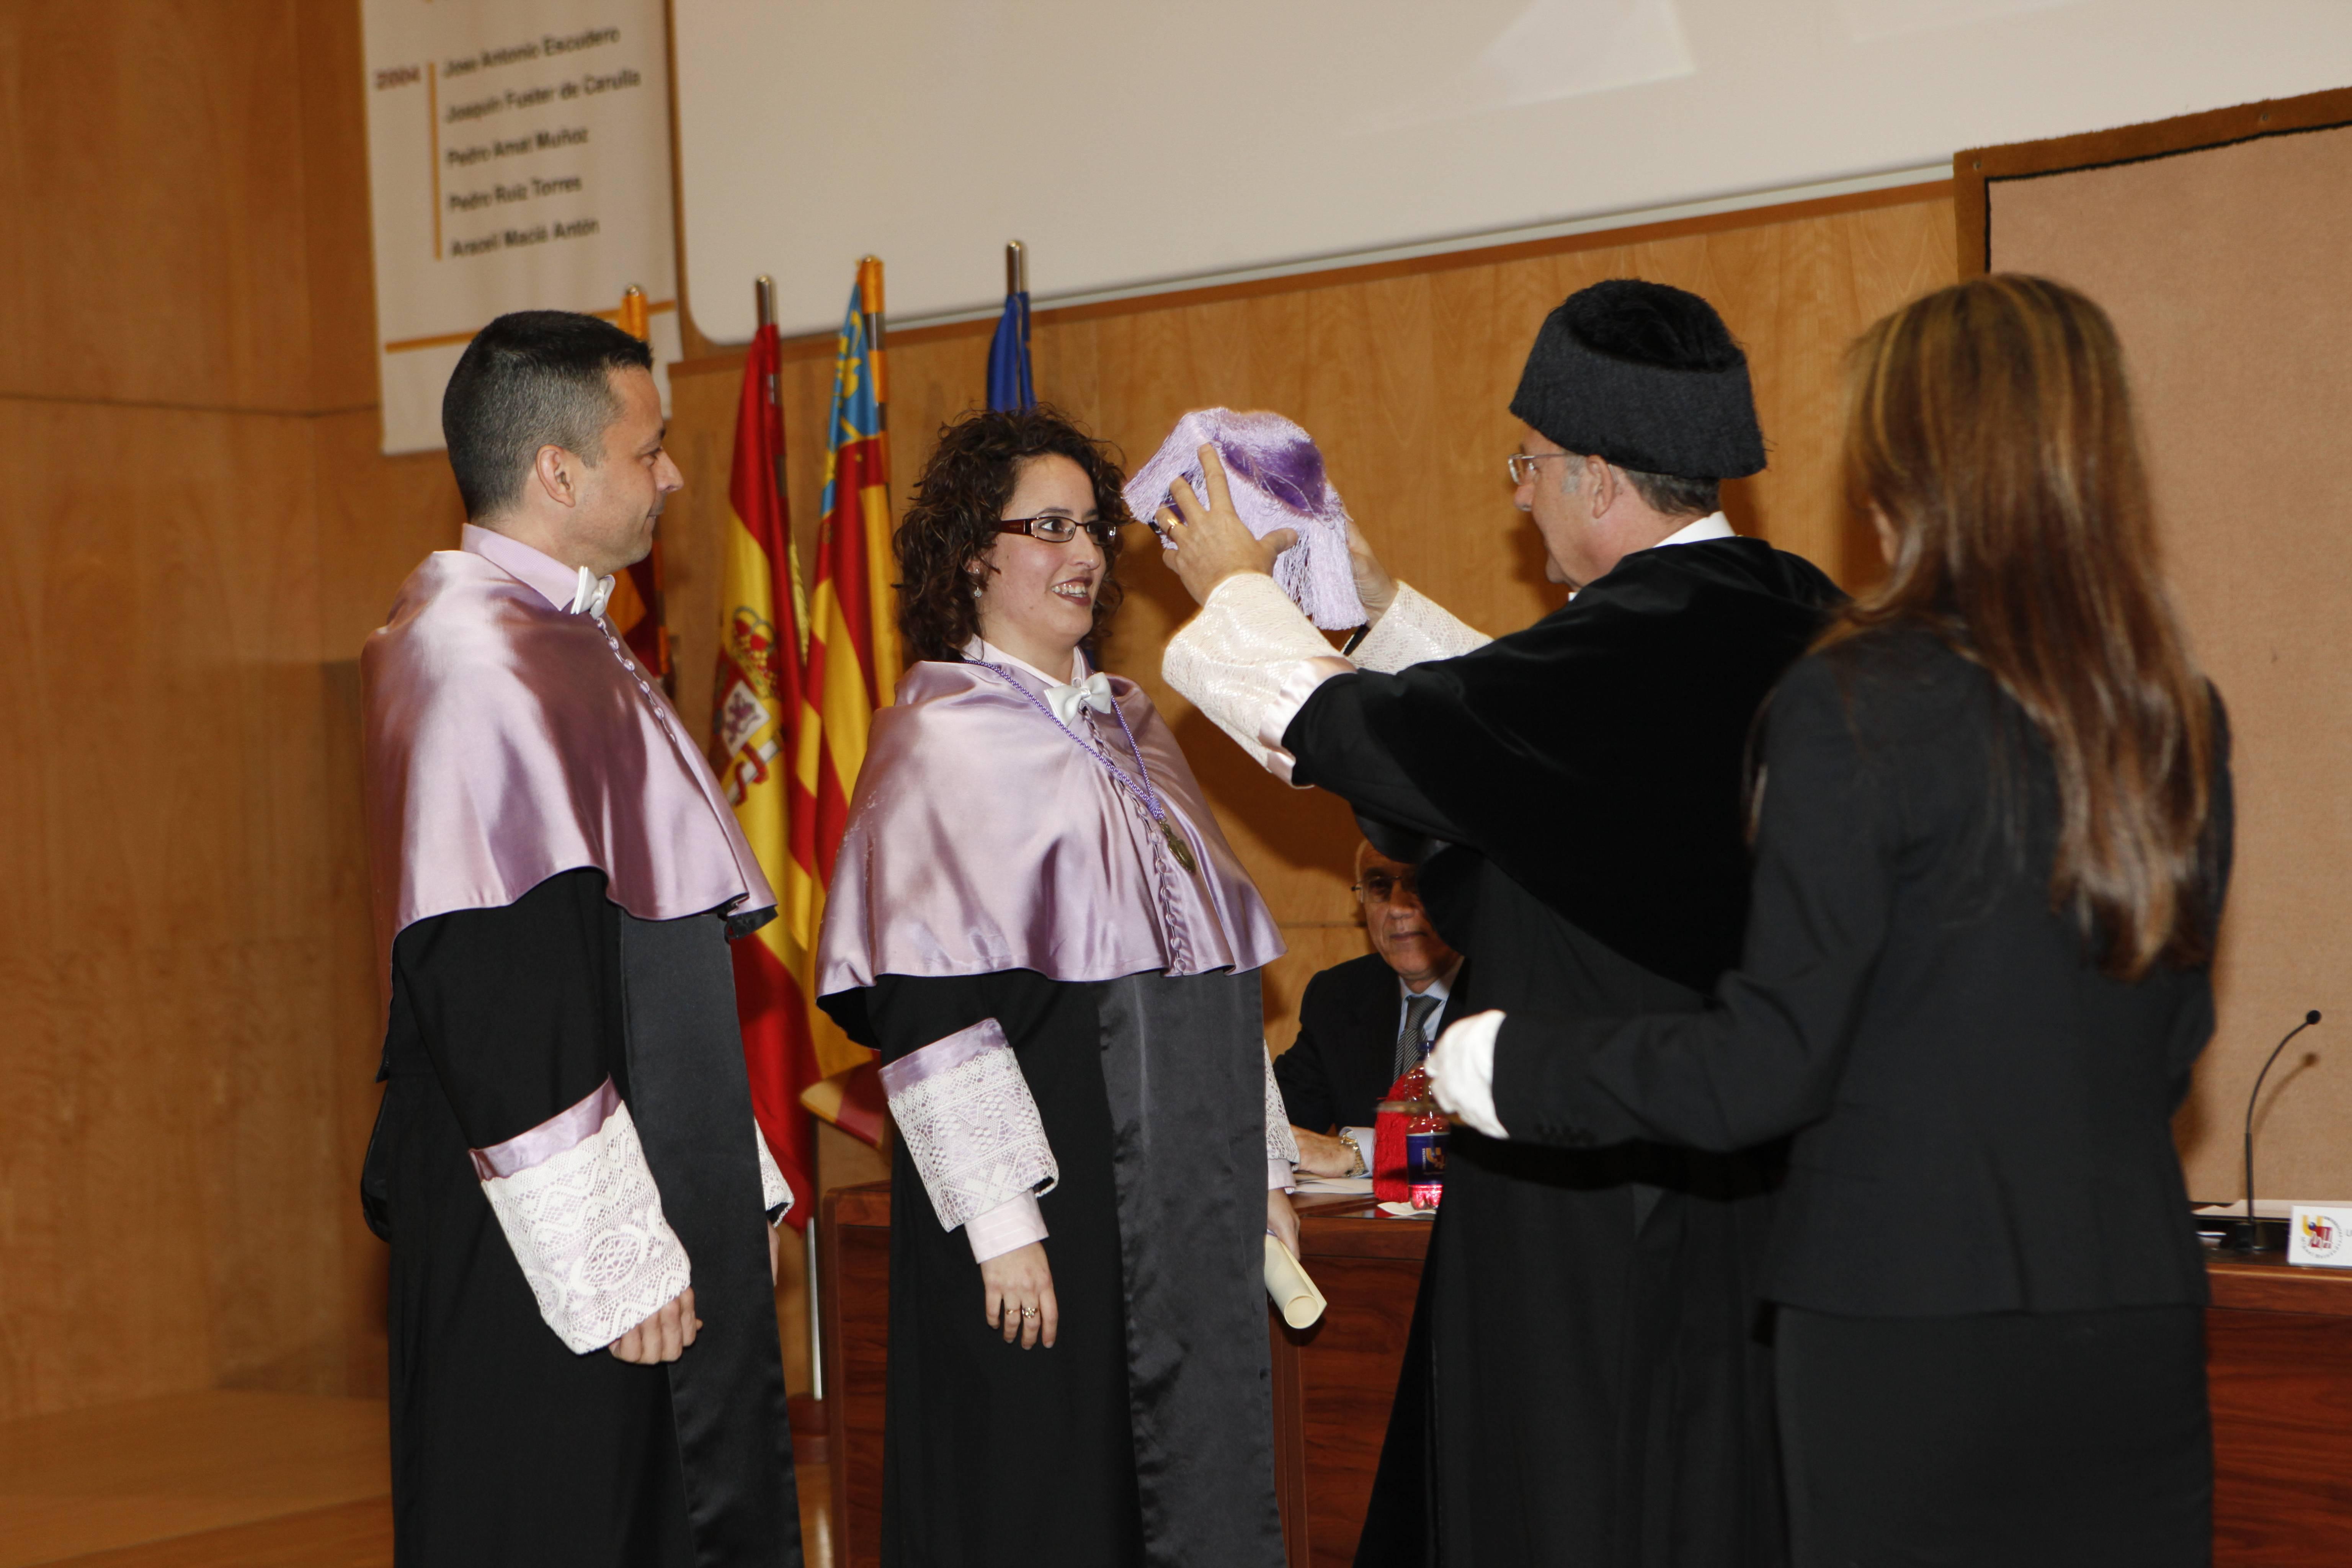 doctor-honoris-causa-luis-gamir_mg_1157.jpg